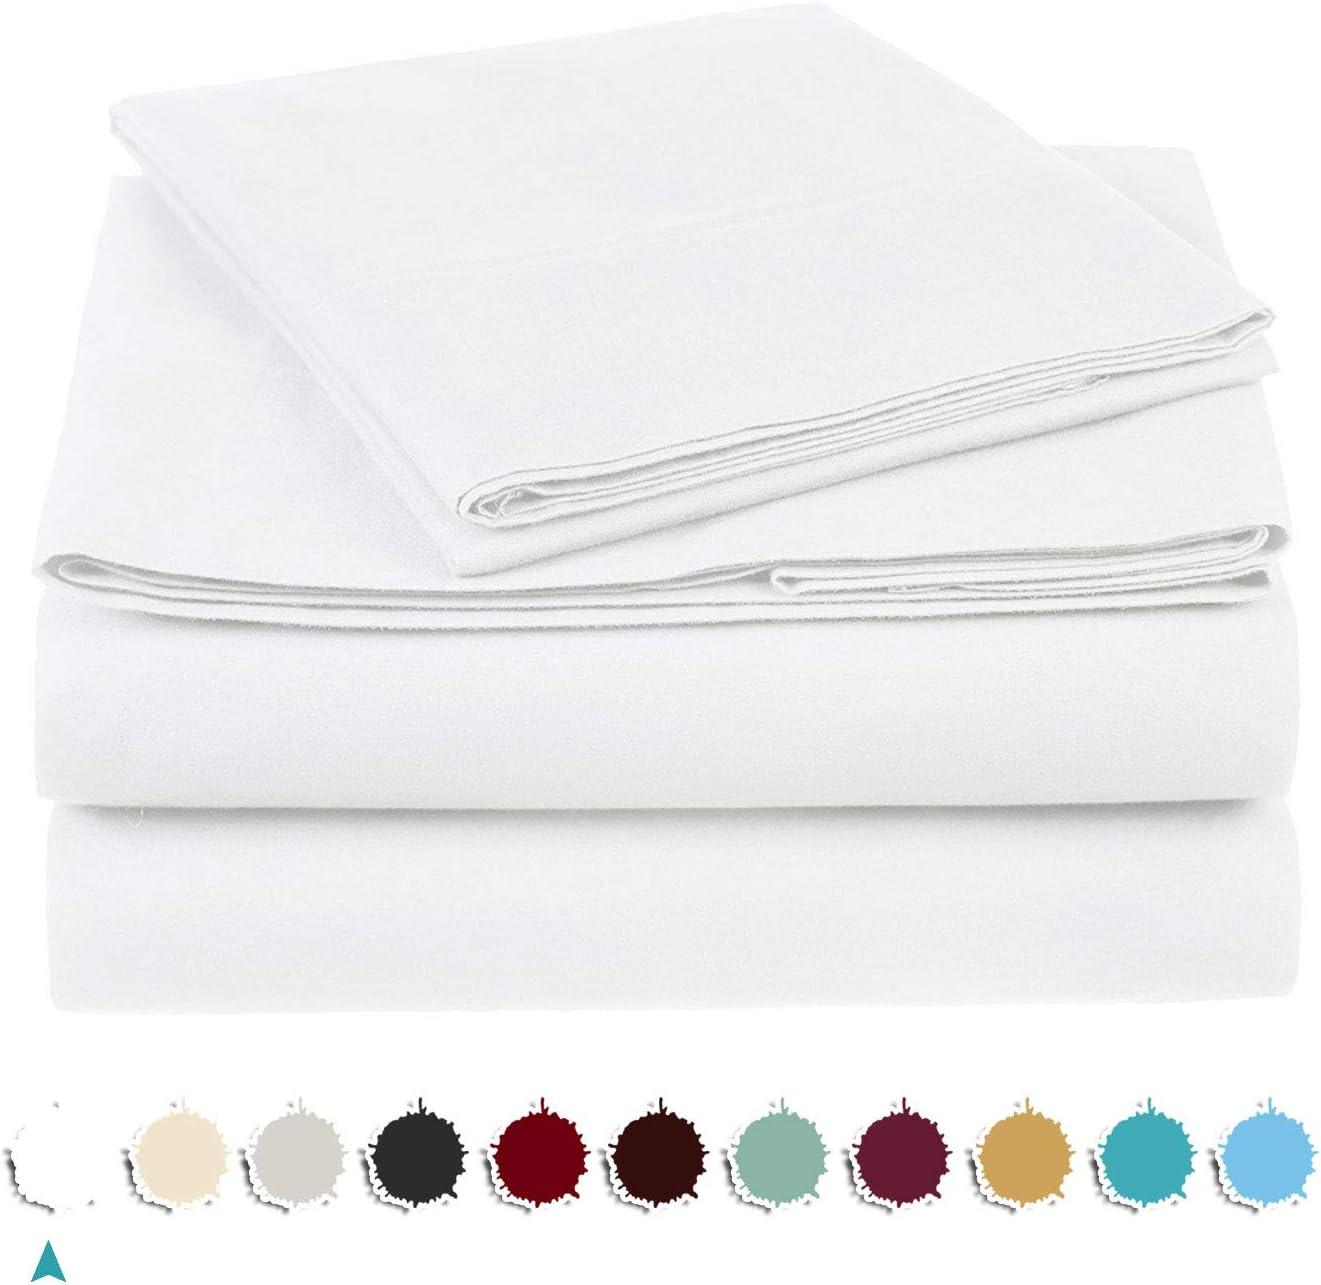 "Louis Ultra Soft 1000 Count 100% Egyptian Cotton - 4 Piece Bed Sheet Set 21"" Deep Pocket Queen, White."